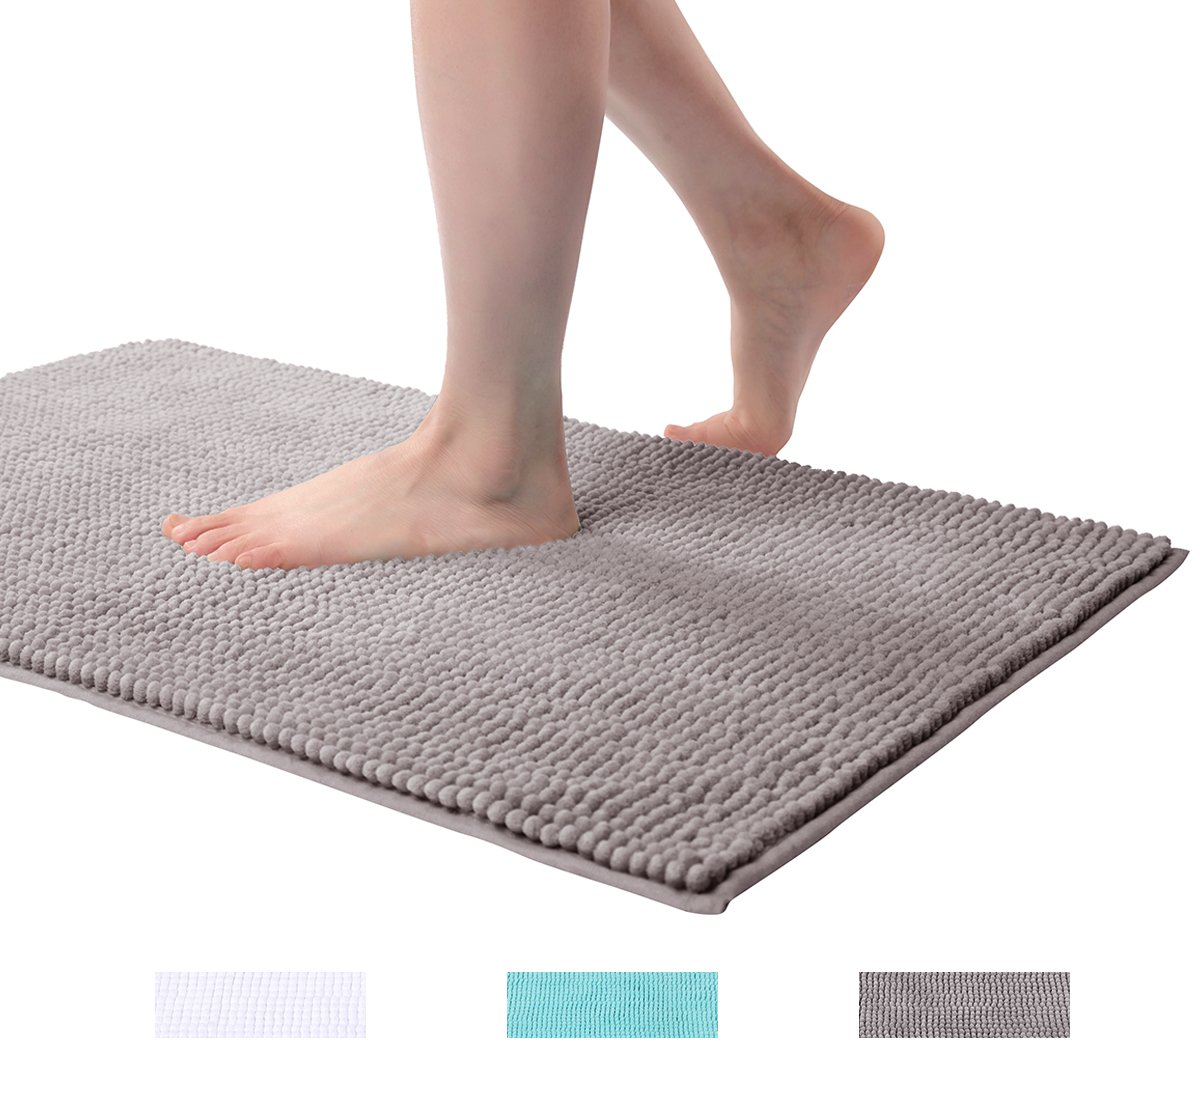 ELBASMT Bathroom Rugs Chenille Bath Floor Mat Phthalates Free, Antibacterial, Soft Microfibers (20'' x 32'', Light Gray) by ELBASMT